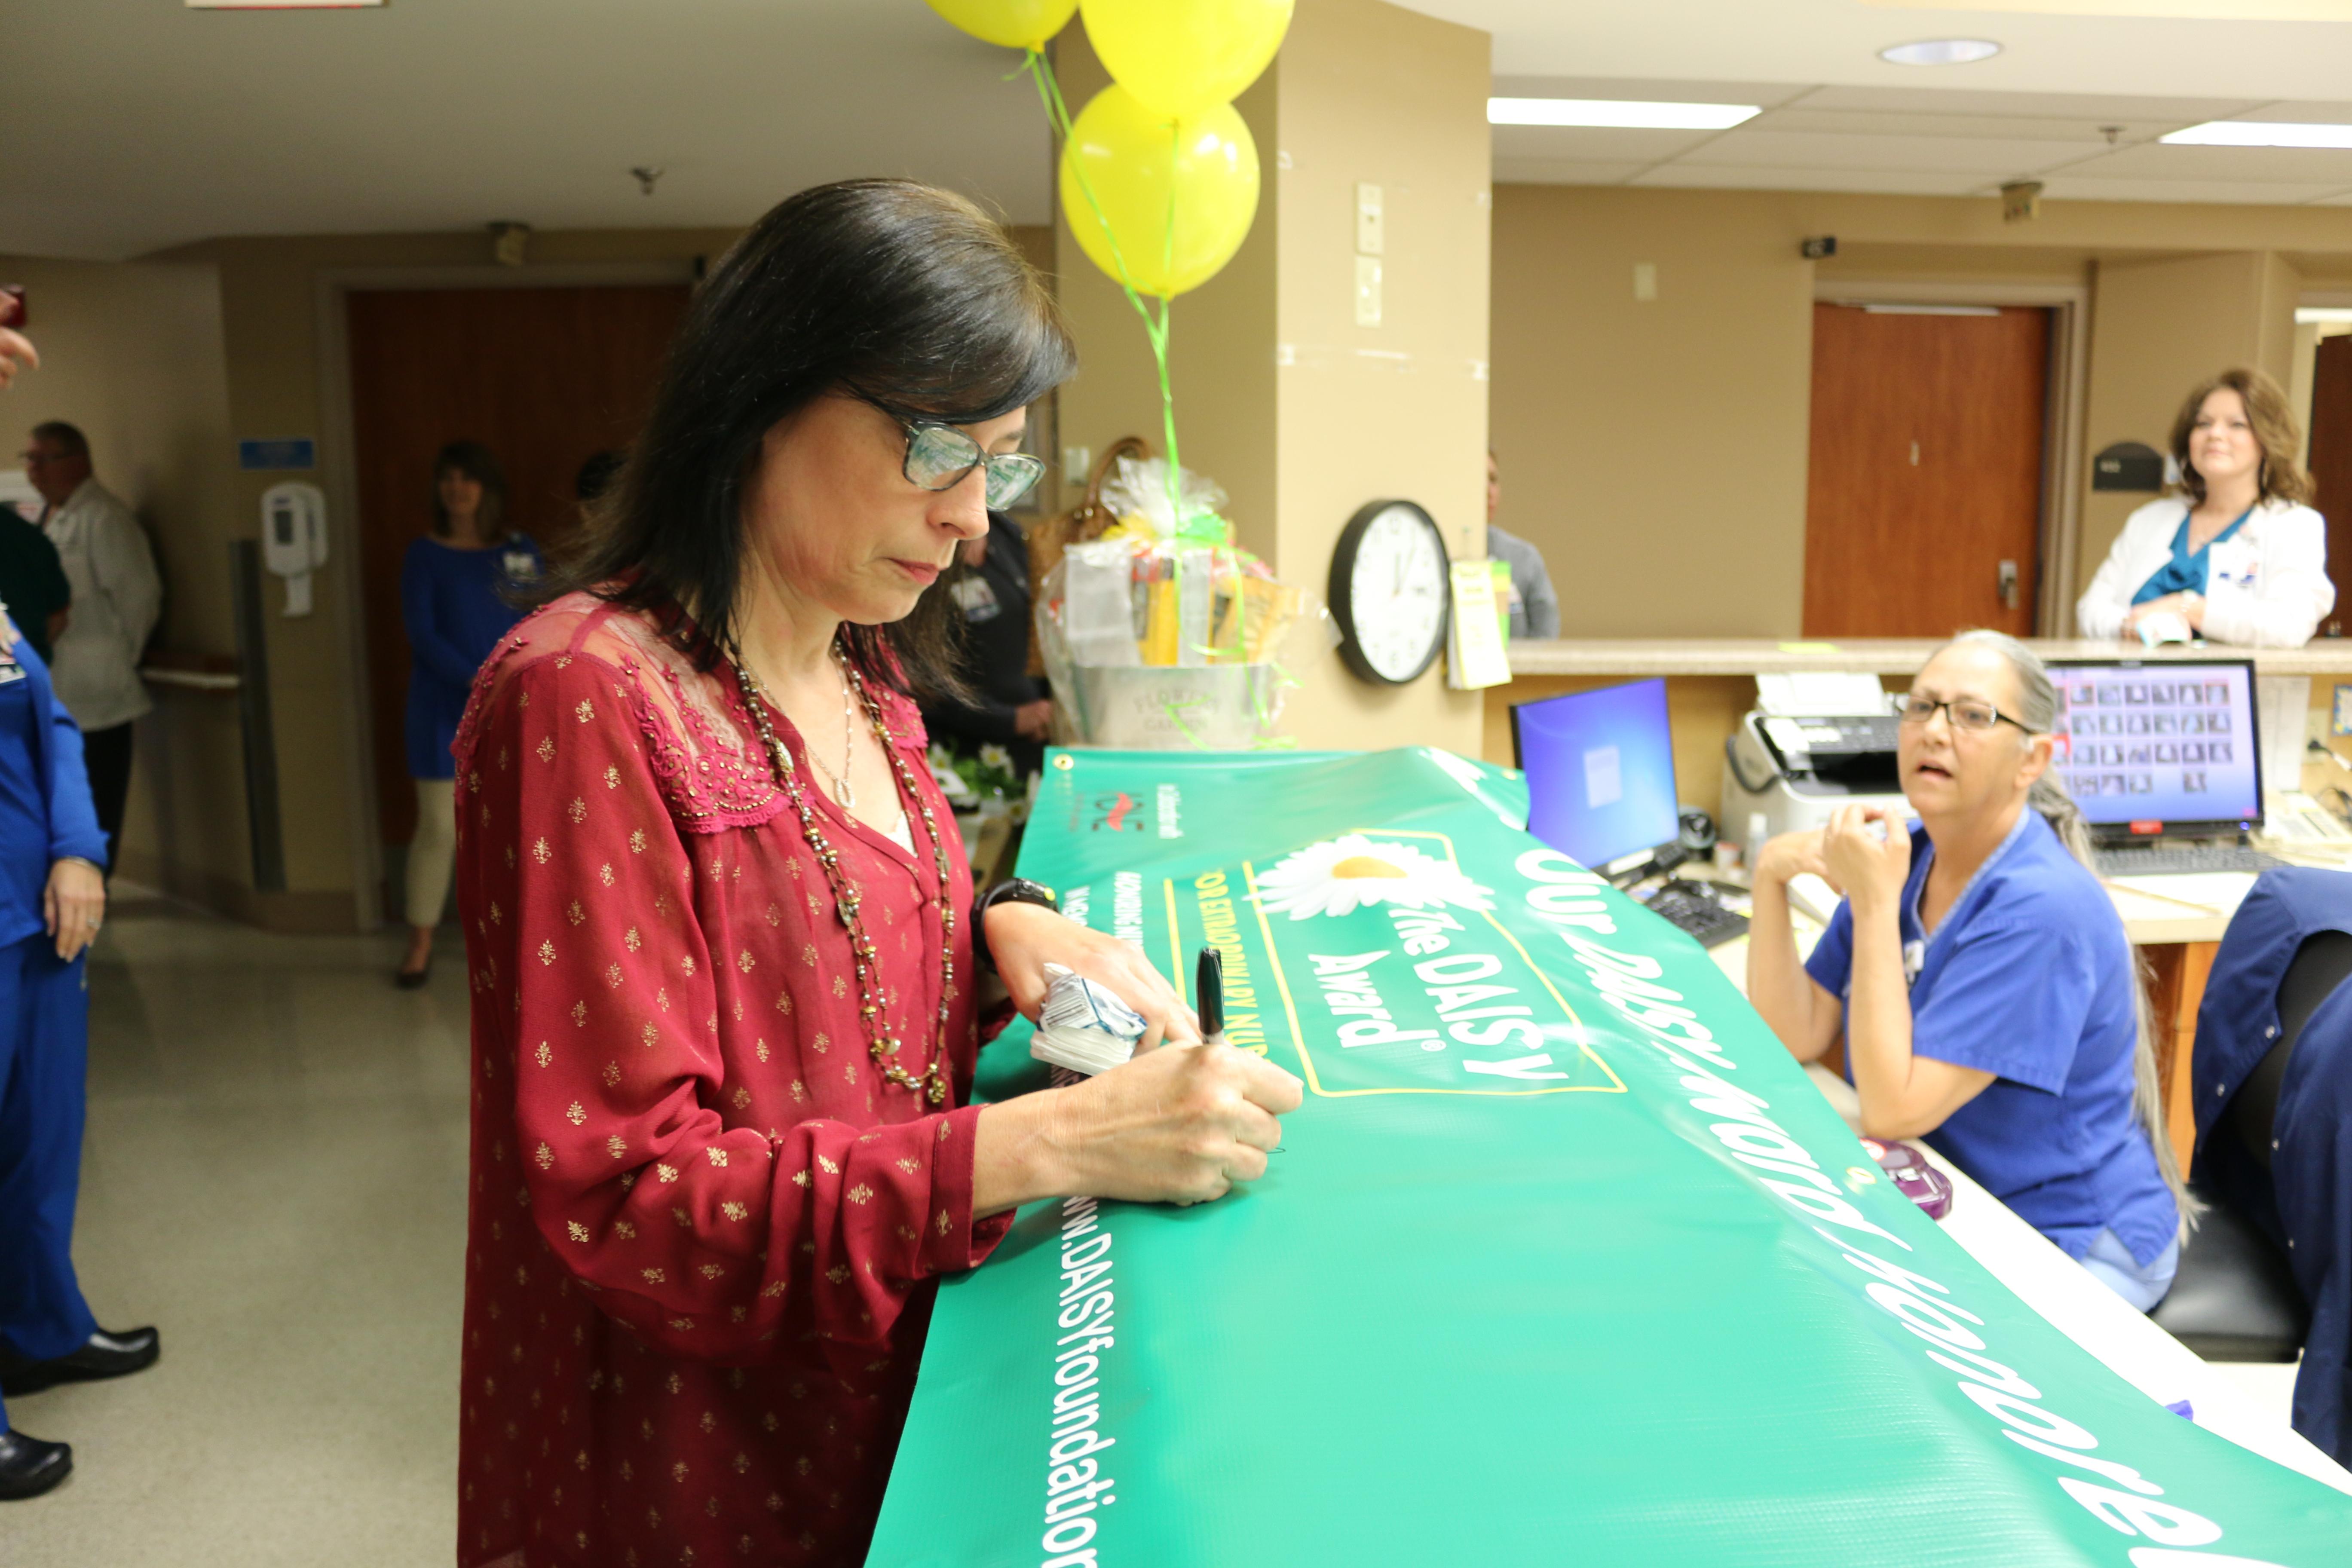 Daisy award signing banner